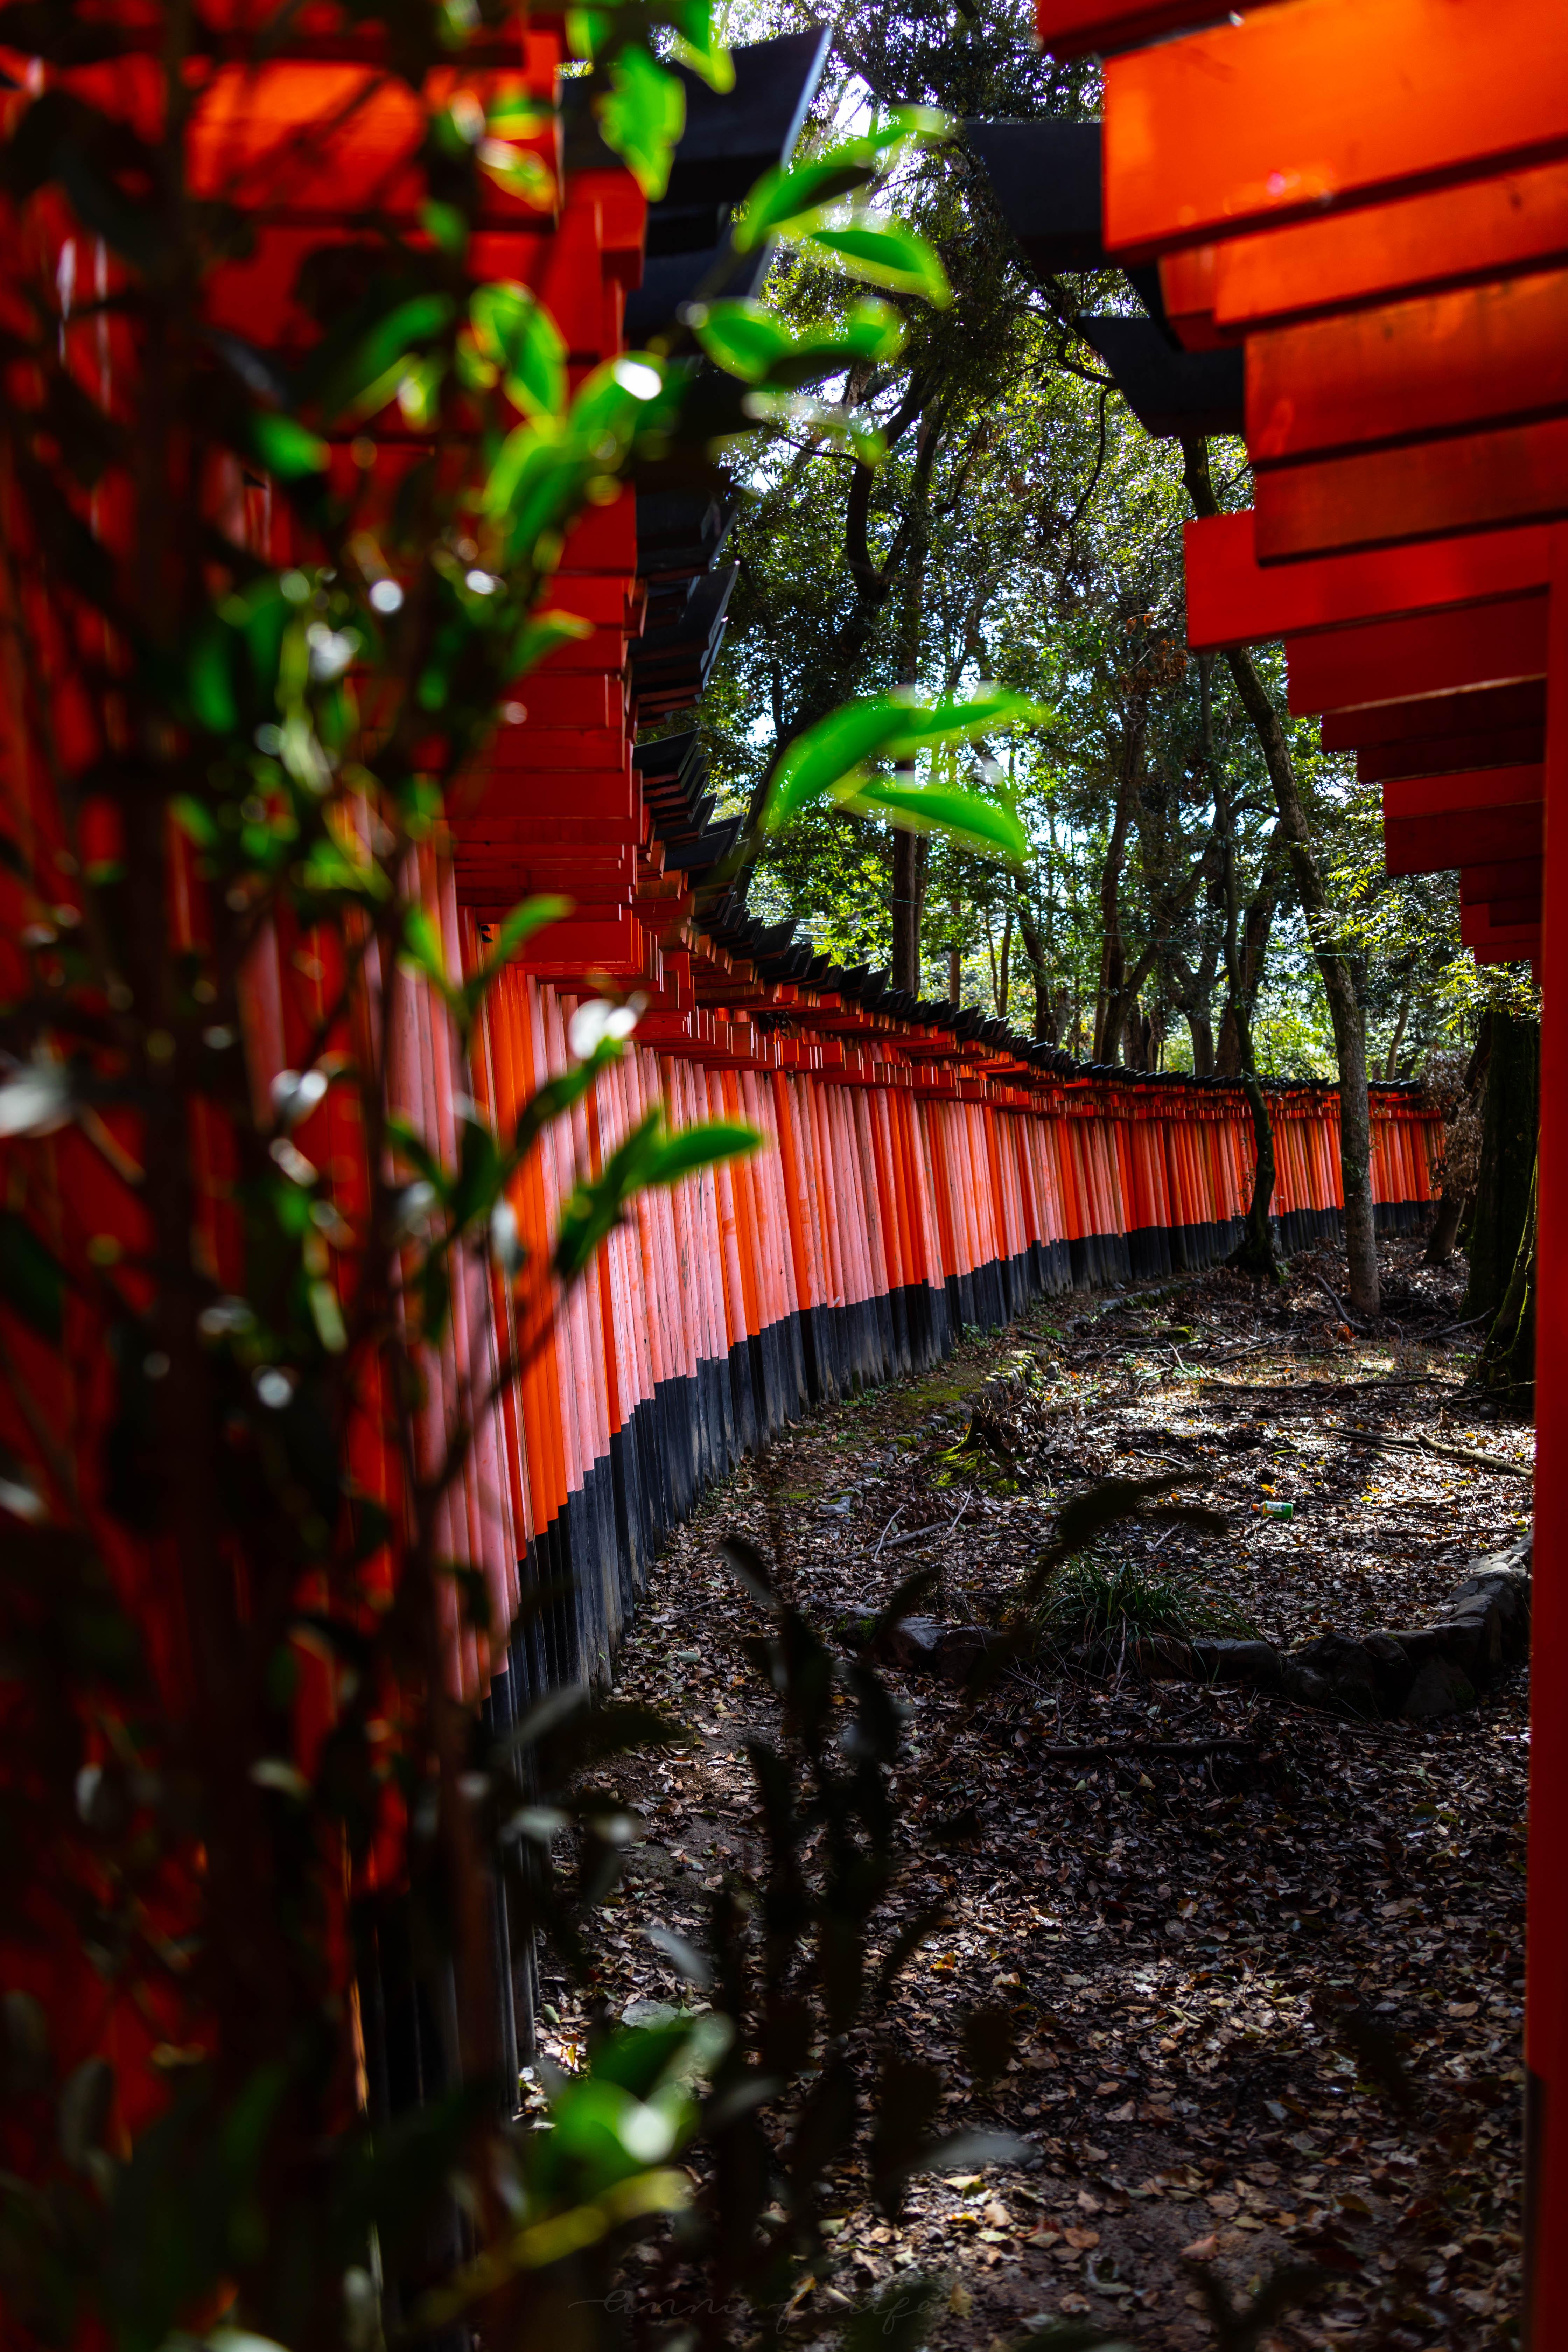 Red Japanese Torii Gates at Fushimi Inari Shrine Kyoto